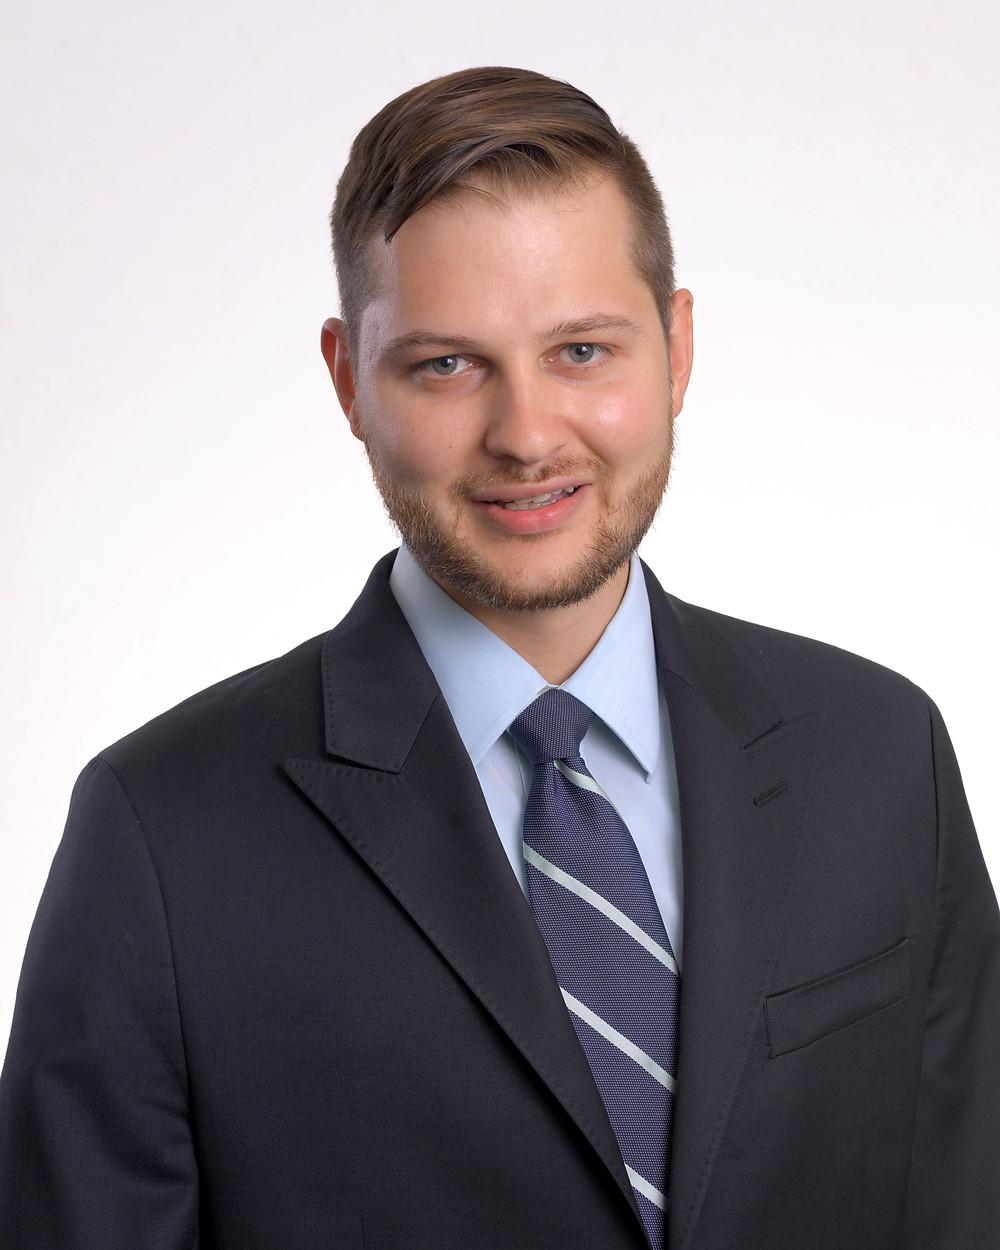 Michael Buonassisi